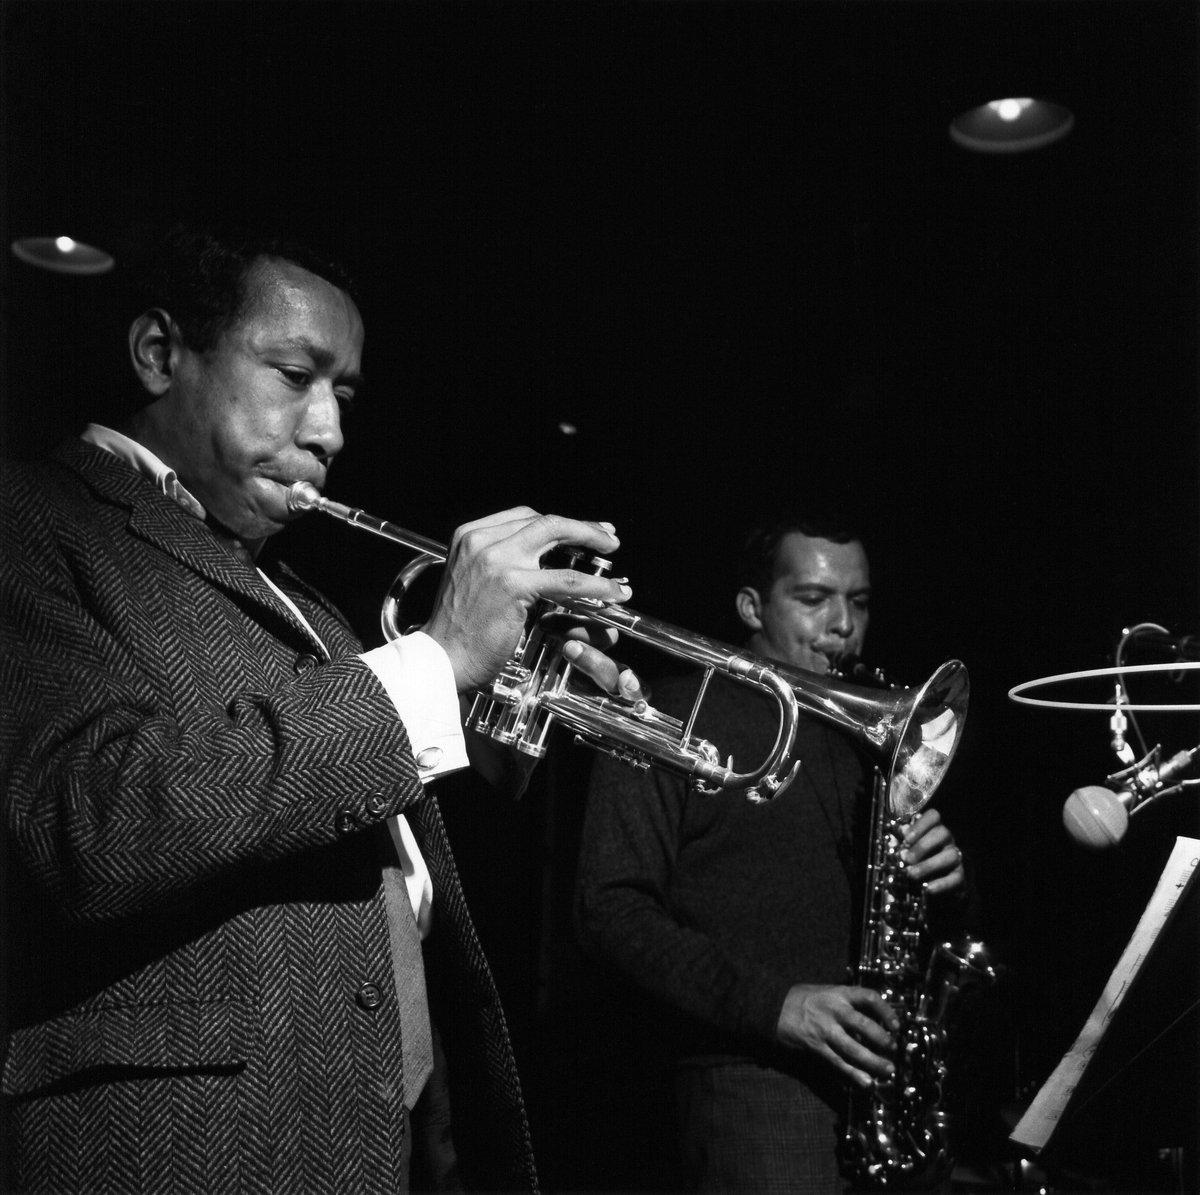 50 yrs ago today trumpeter #LeeMorgan recorded his album 'Infinity' ft altoist #JackieMcLean https://t.co/0IzZBmTfAV